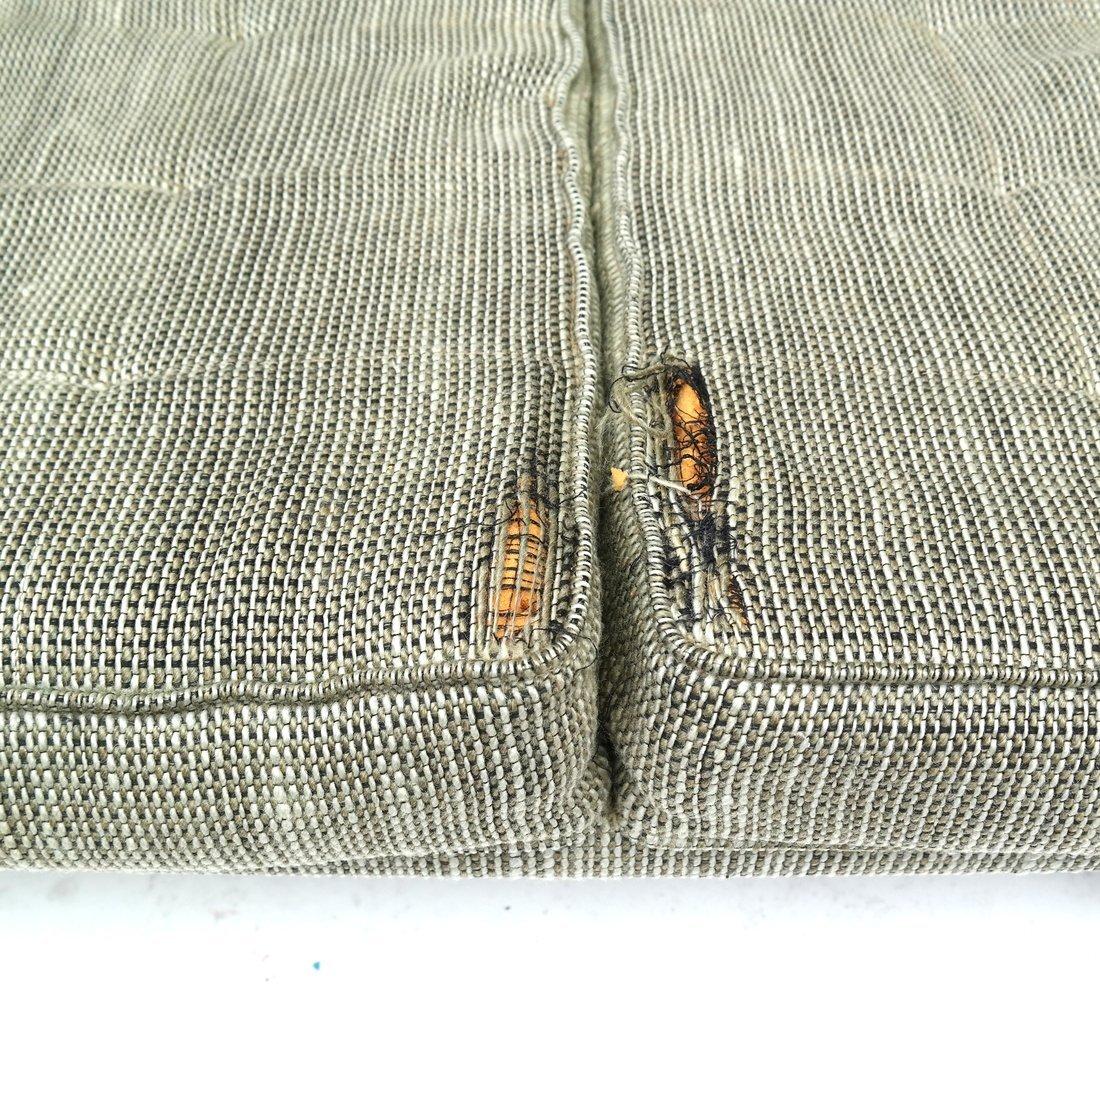 Knoll Green Upholstered Sofa - 5